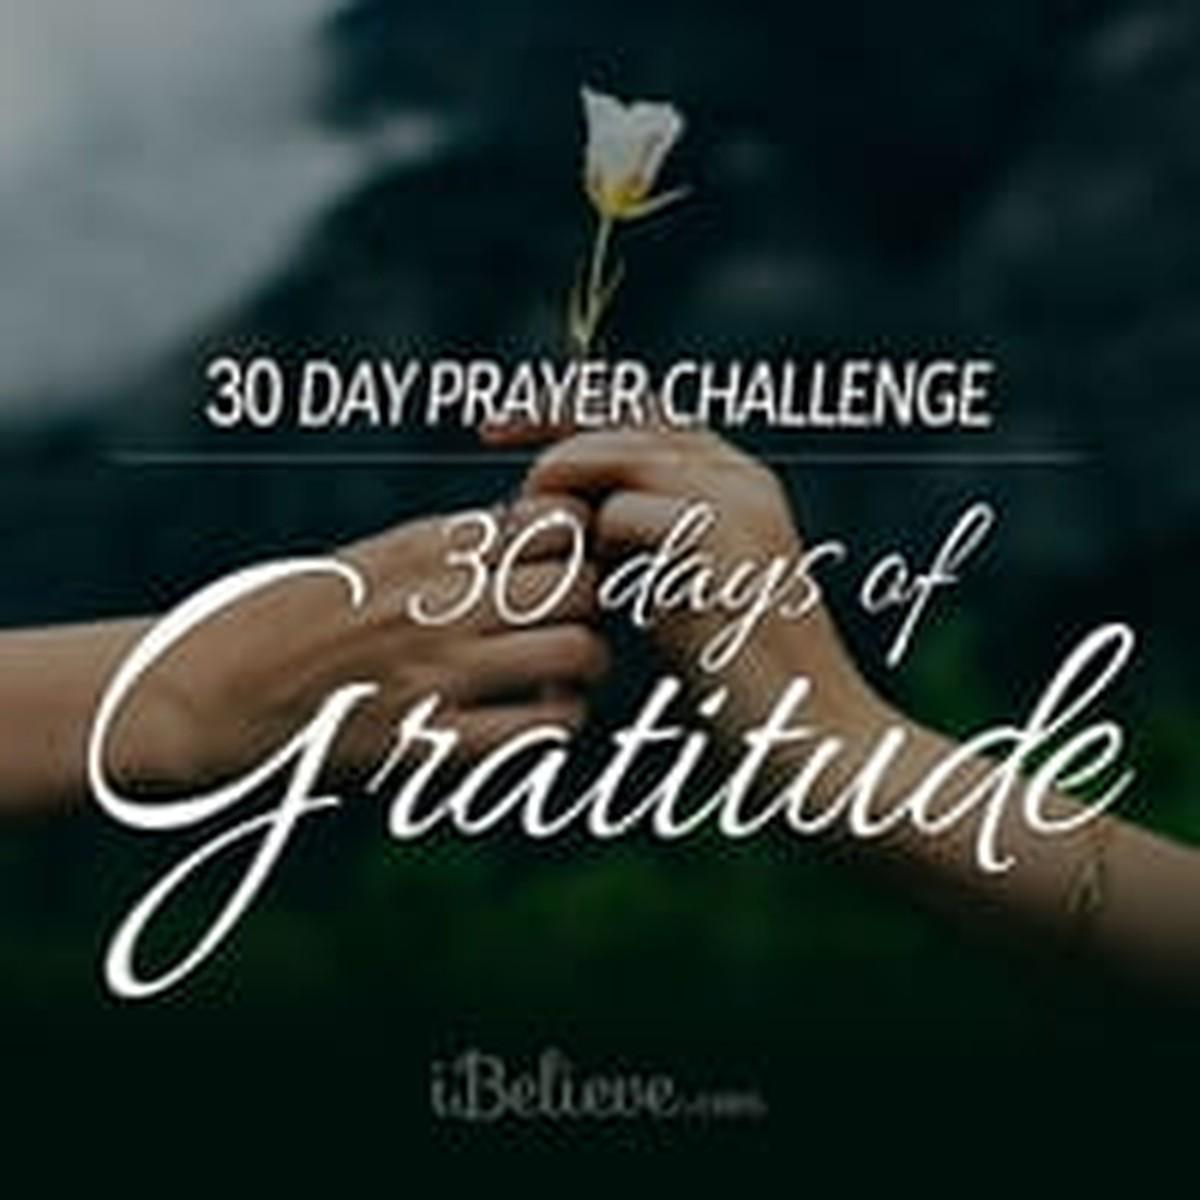 Our 30 Days of Gratitude Prayer Challenge